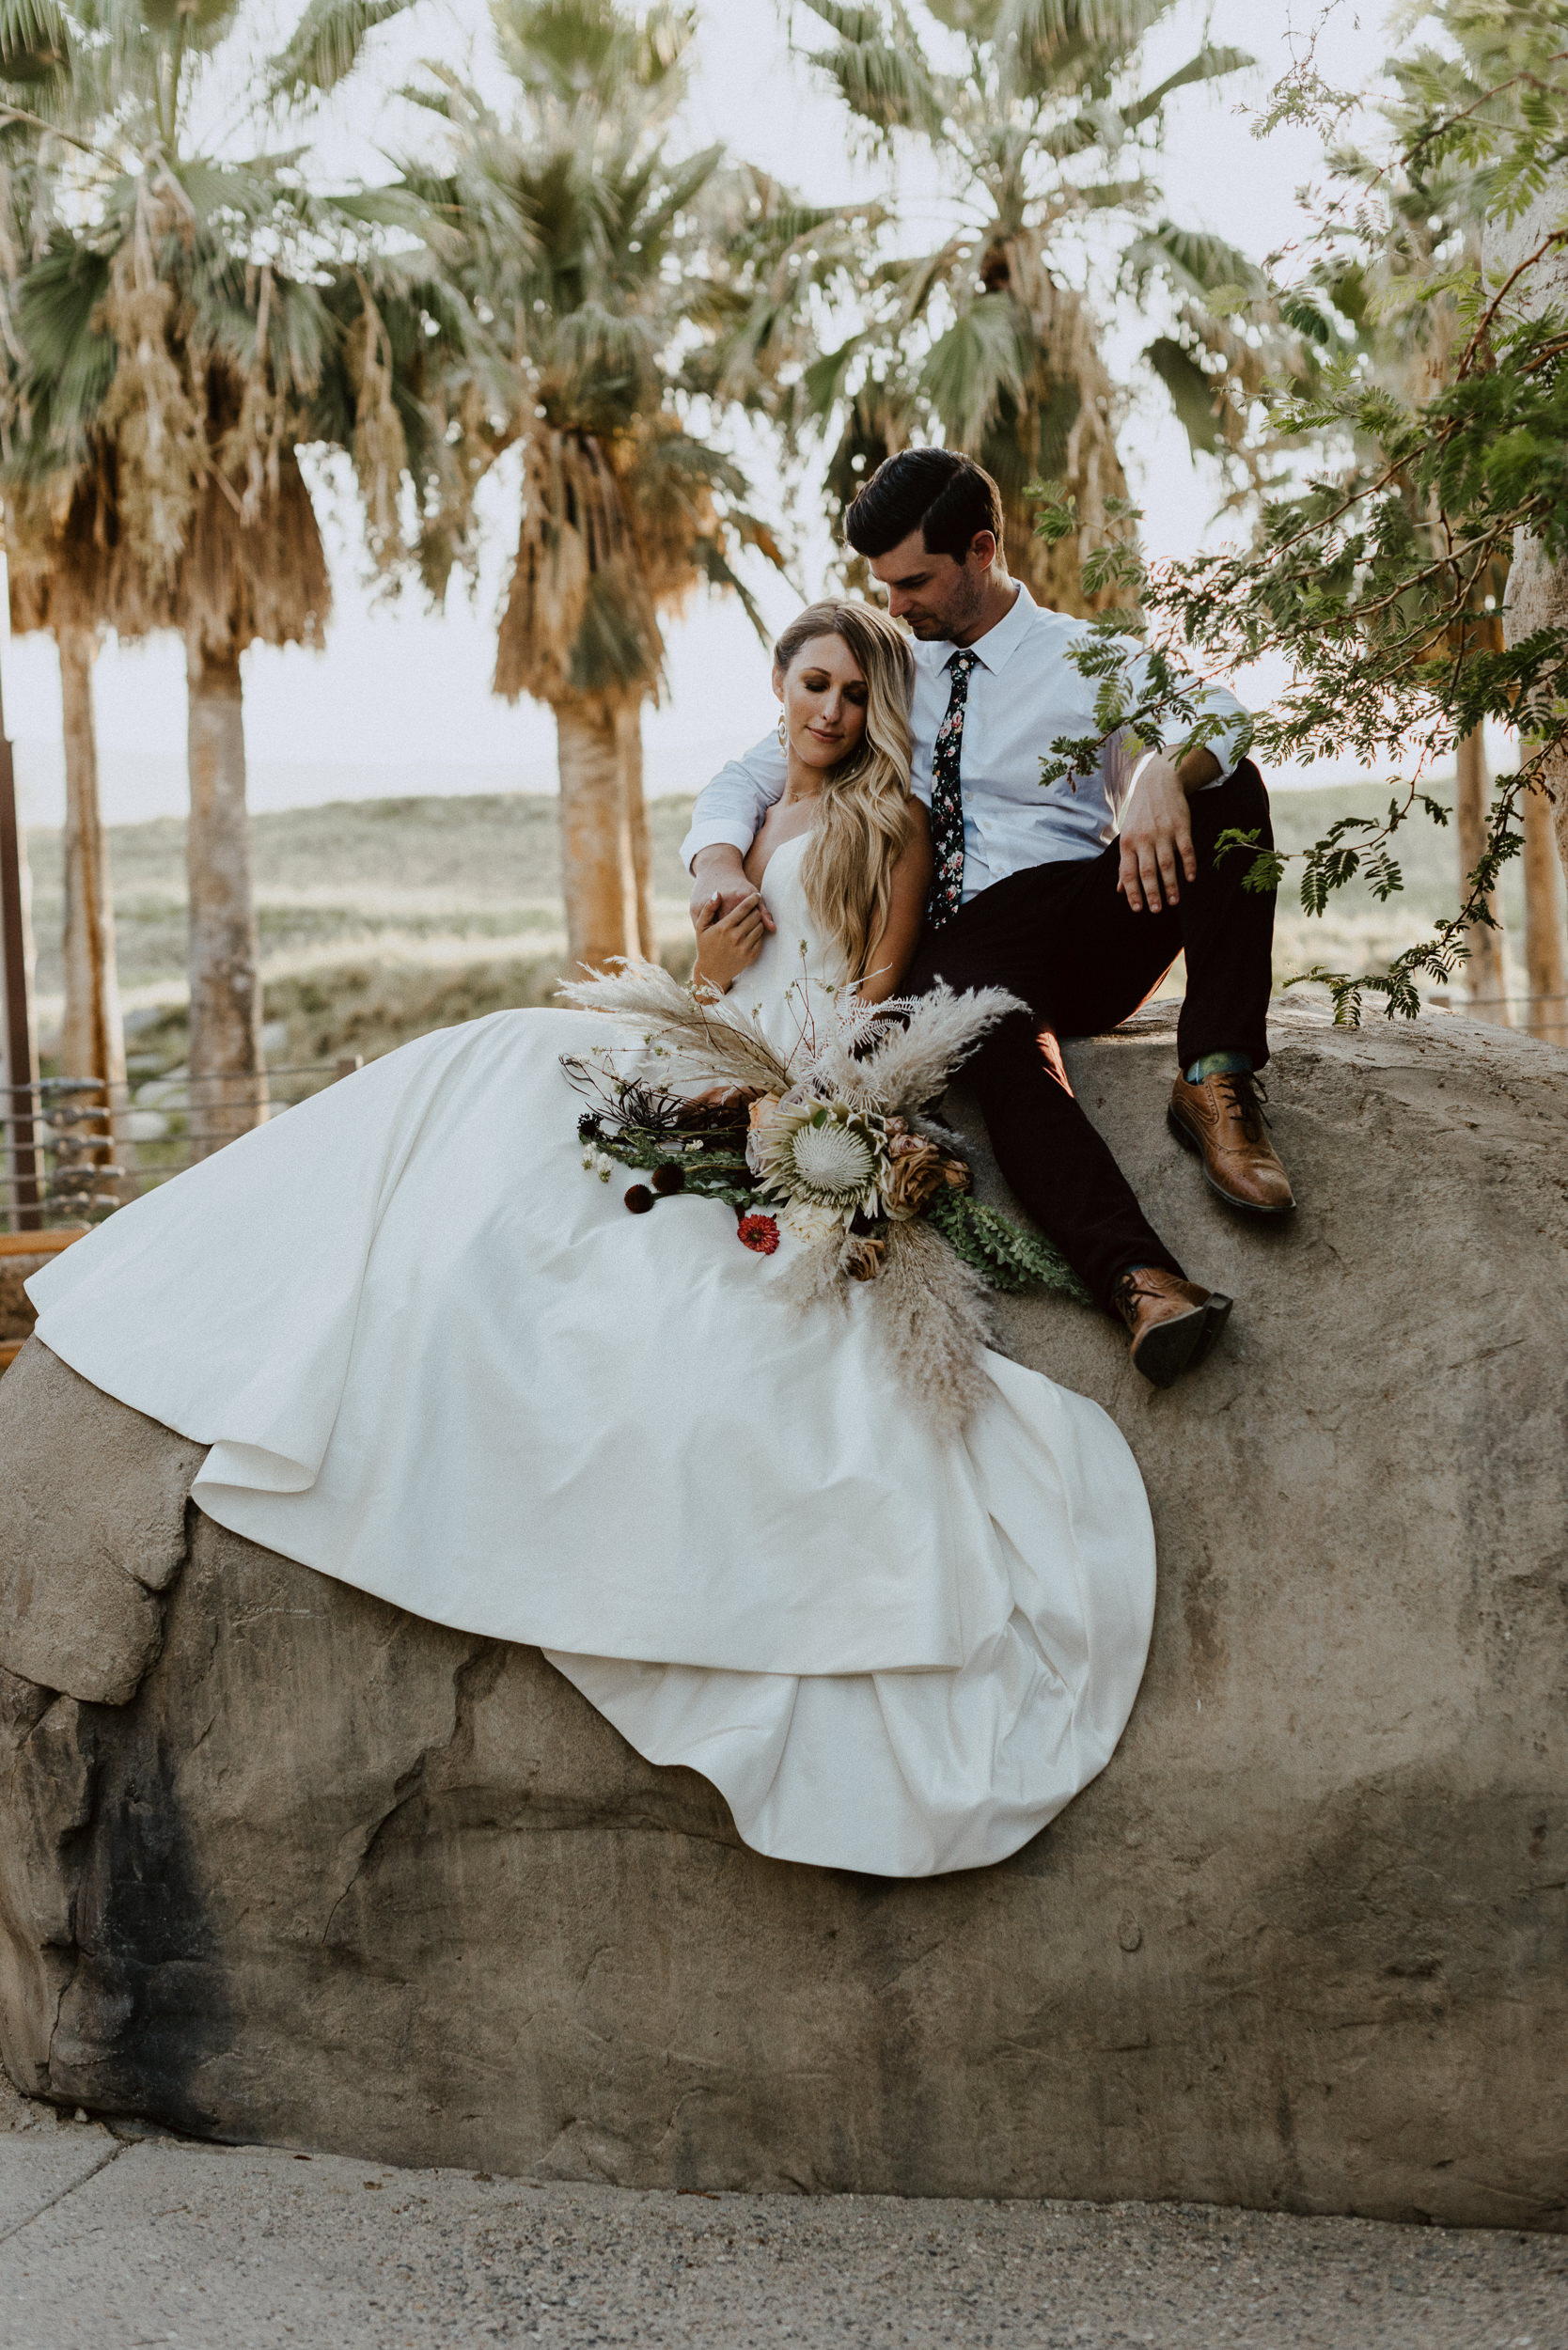 sChelsie + Chris - The Desert Shootout Wedding Romantics at The Living Desert-103.jpg